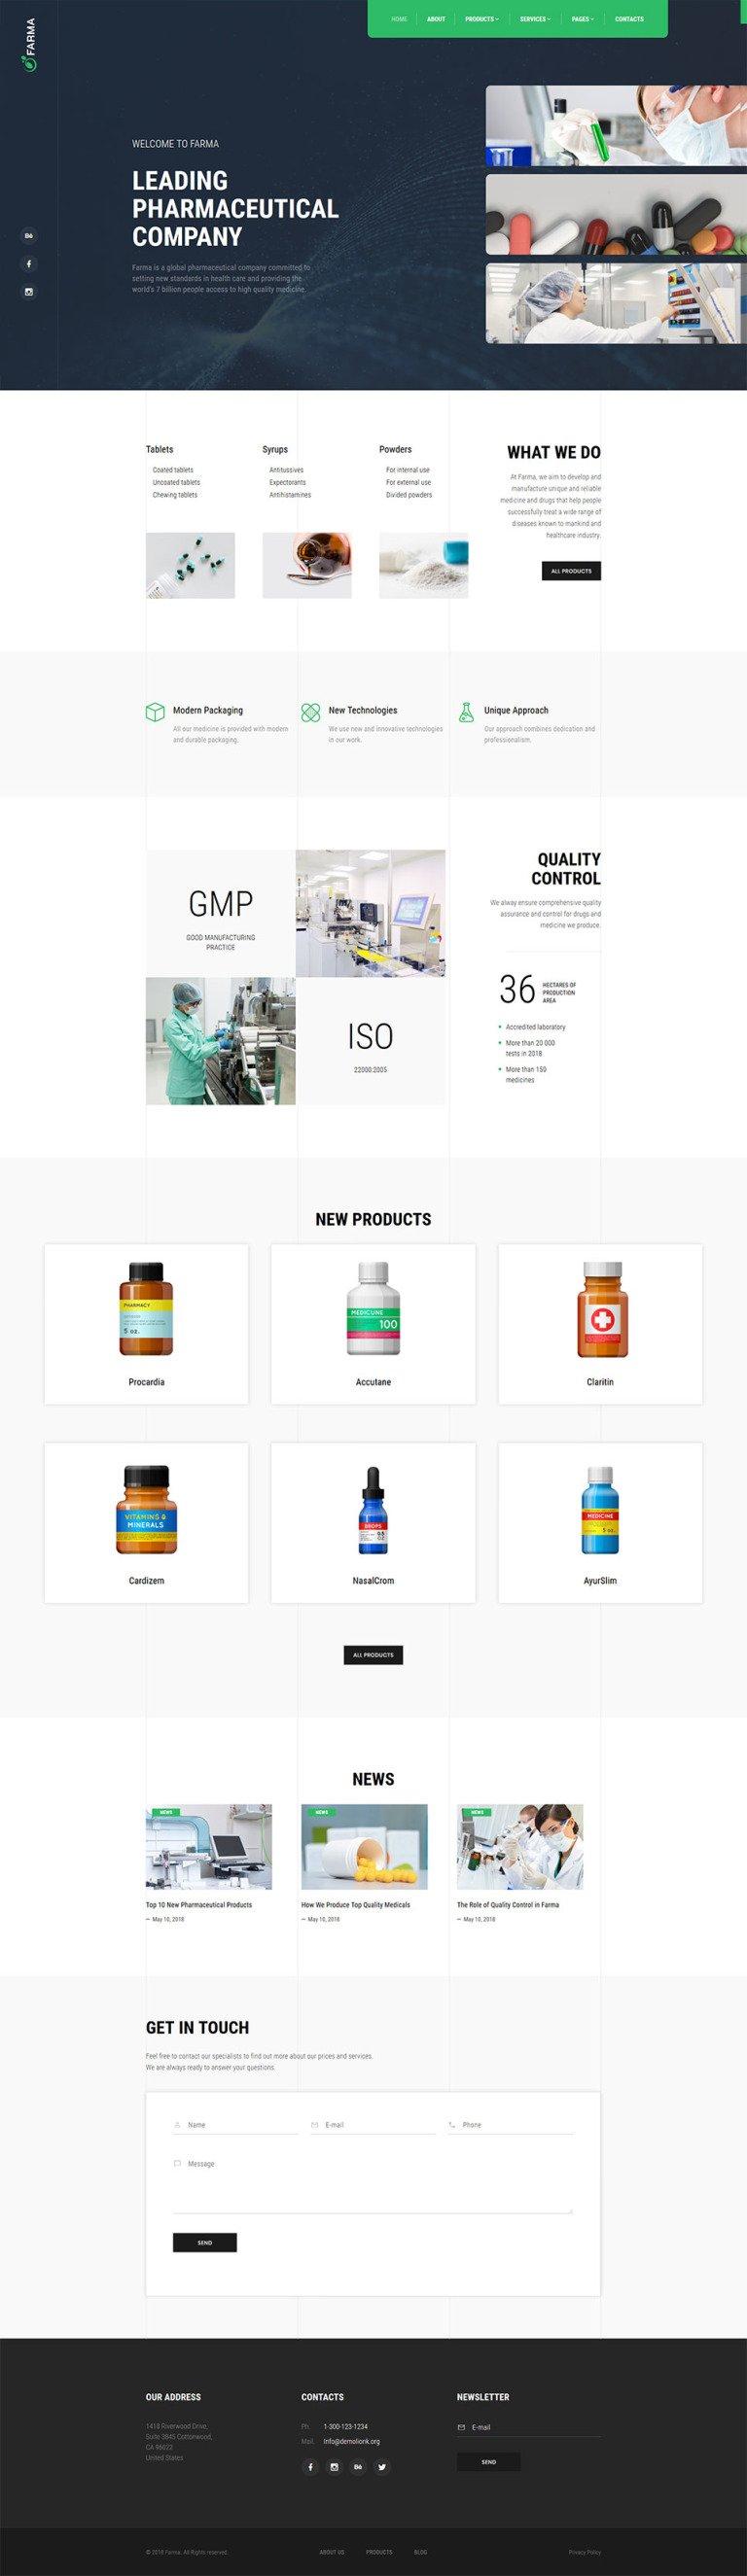 Pharmacy Co. - Medical & Drug Store Website Template New Screenshots BIG